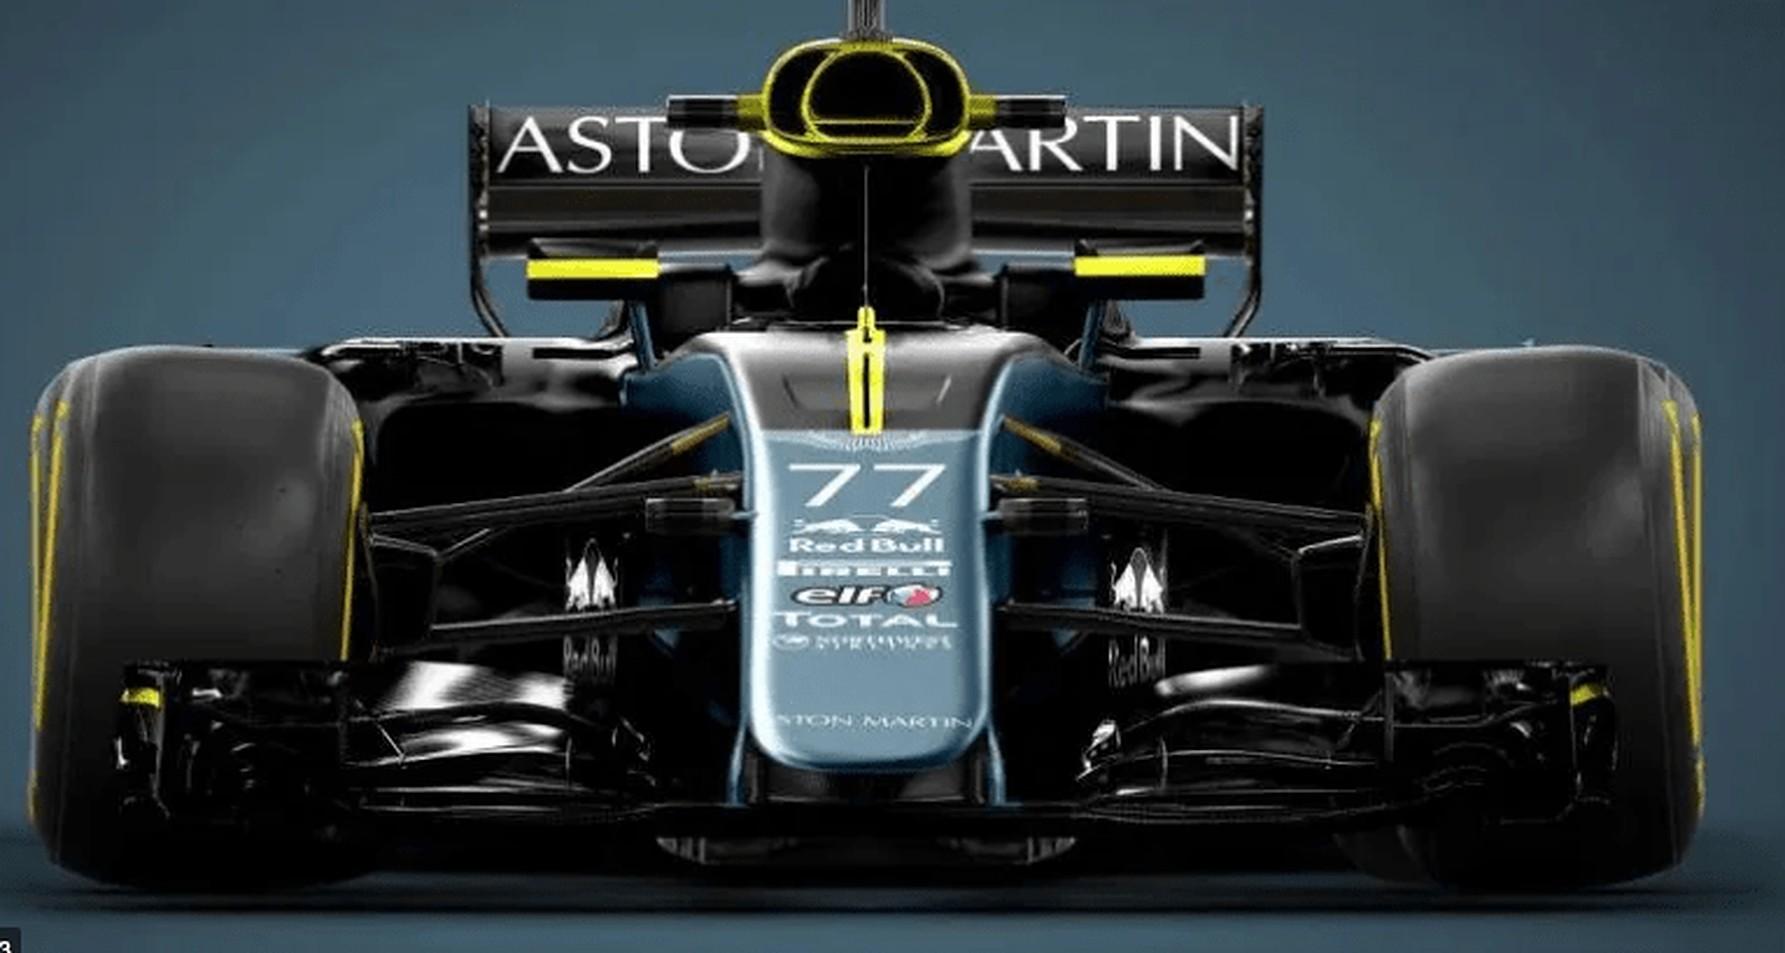 Aston Martin F1 Car Concept Sebastian Vettel - article by Suliman Mulhem